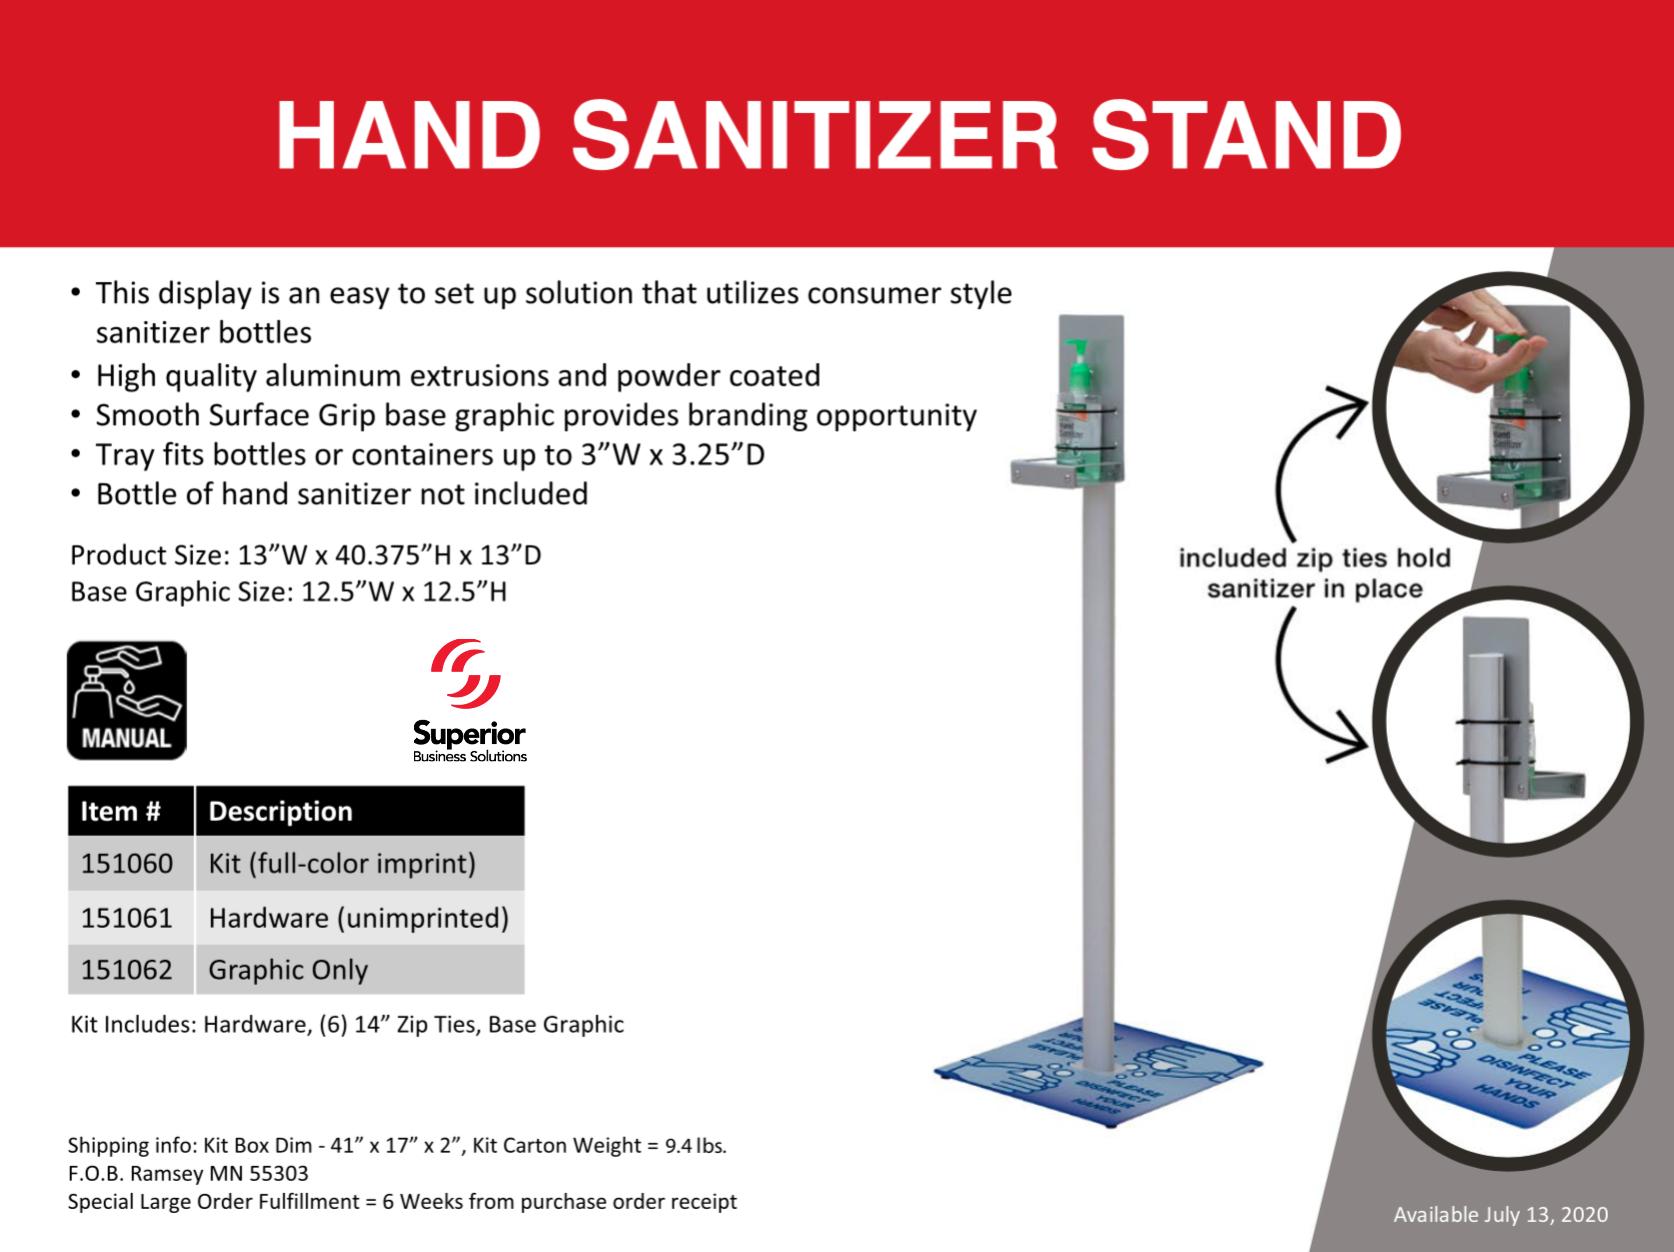 branded-hand-sanitizer-stand